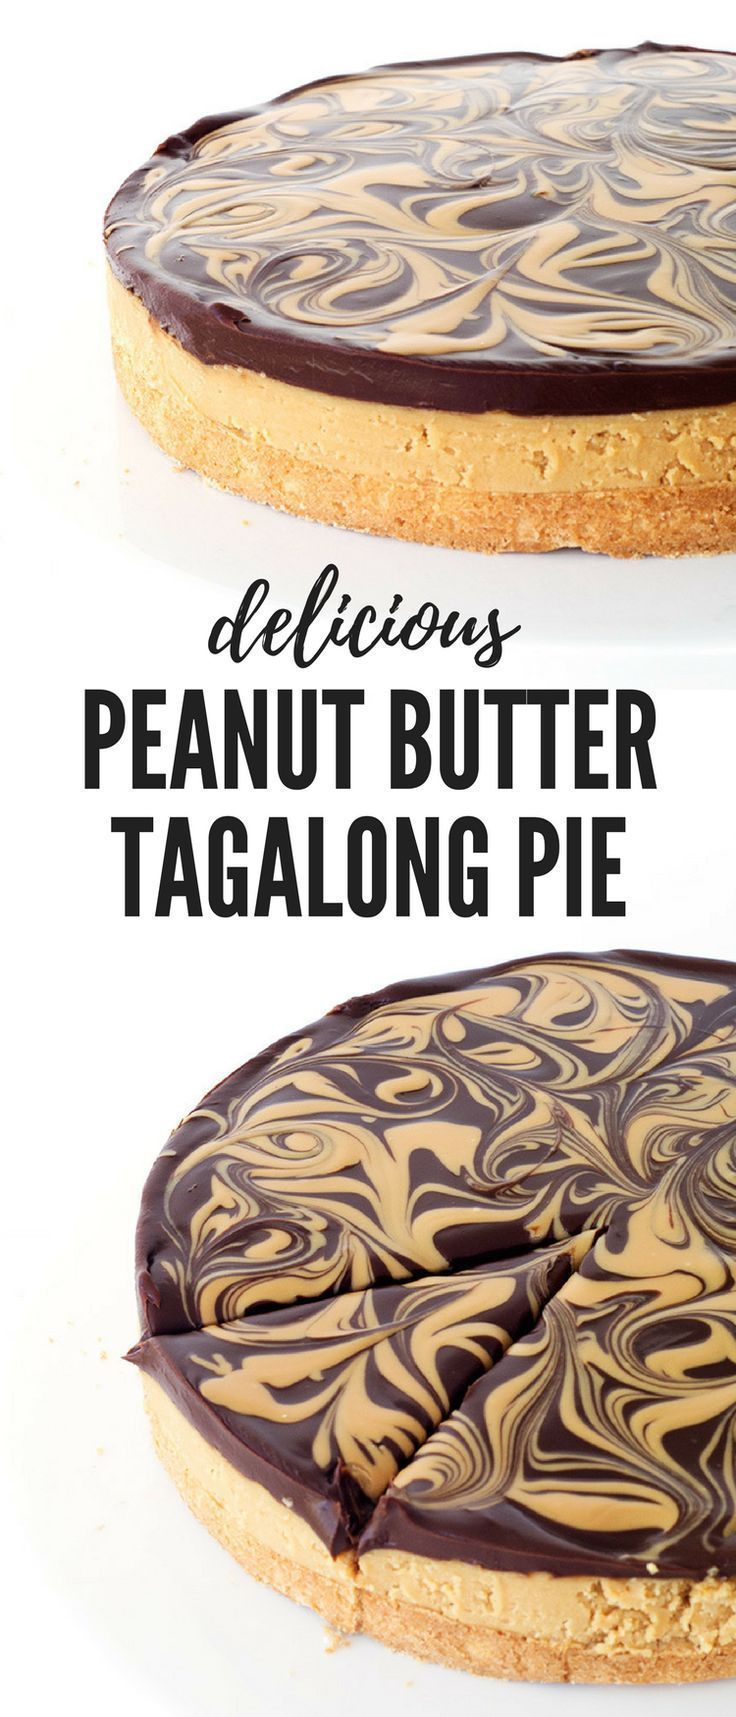 Chocolate peanut butter tagalong pie recipe desserts